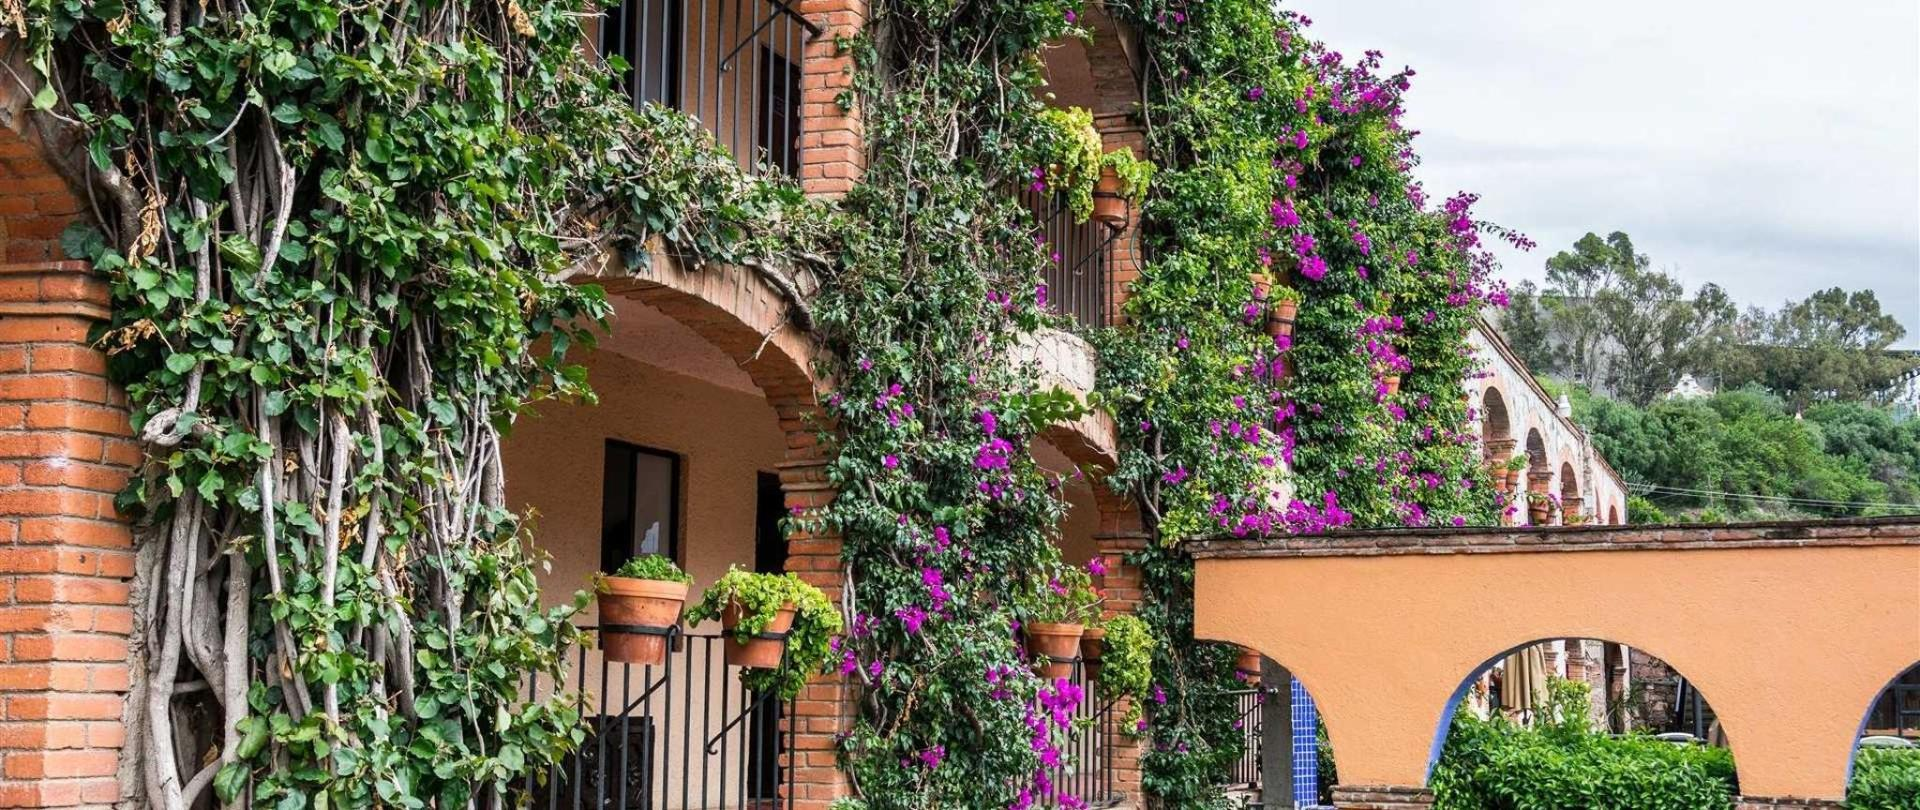 homepage-la-abadia-hotel-guanajuato-mexico2.jpeg